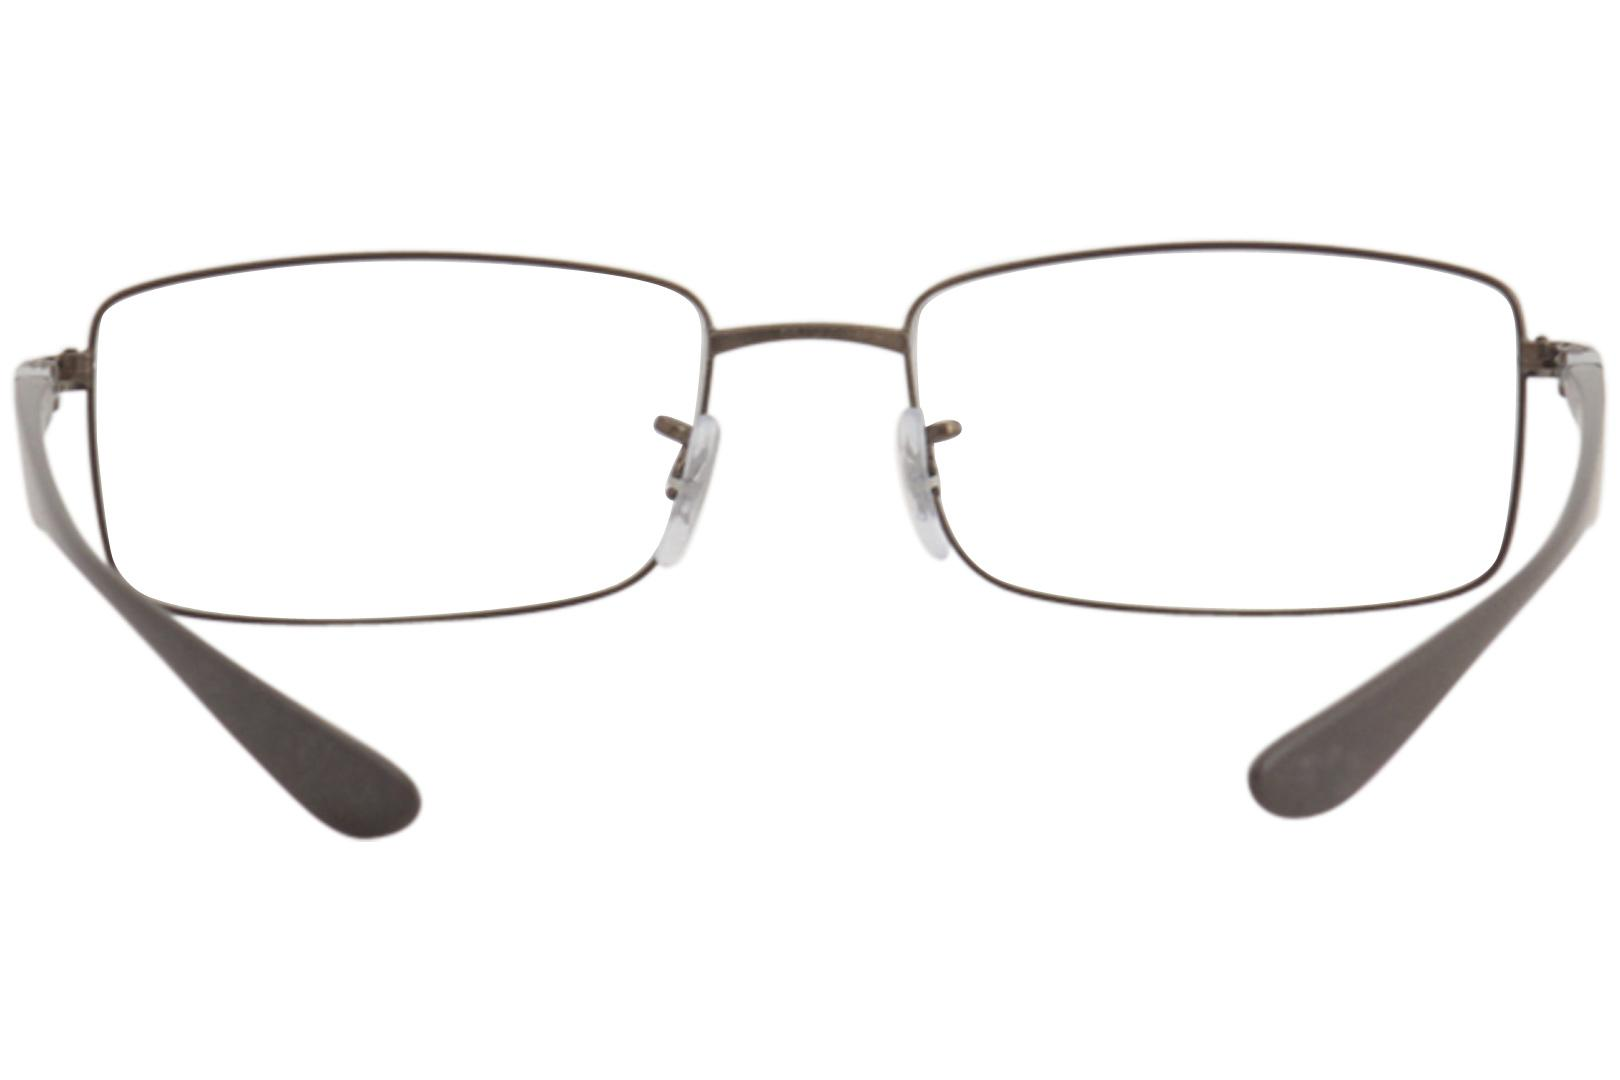 dadcd81019 Ray Ban Men s Eyeglasses Liteforce RX6286 RX 6286 RayBan Optical Frame by  Ray-Ban. 12345